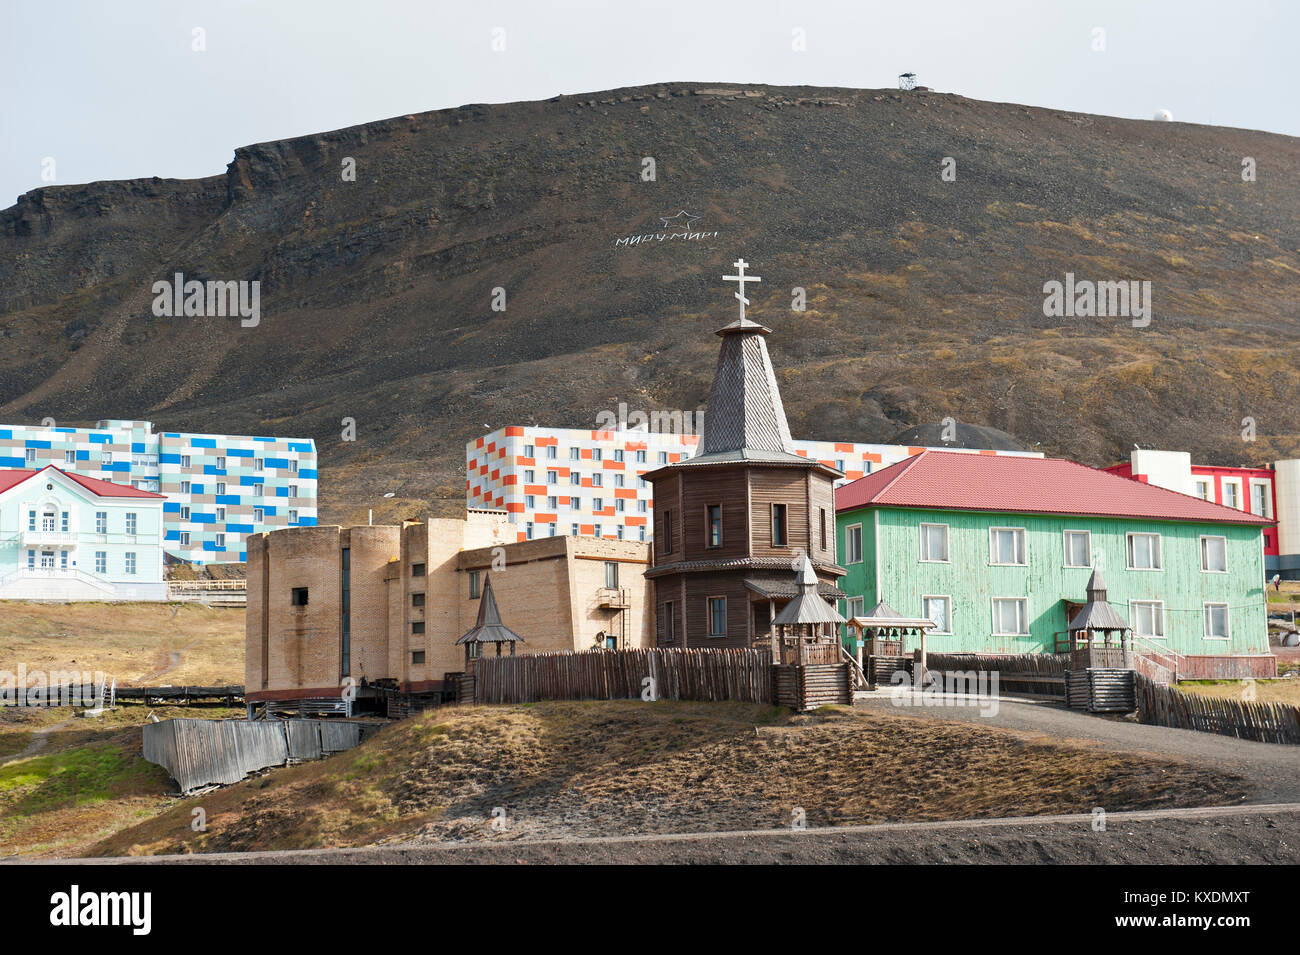 Christianity, Russian Orthodox Church, wooden chapel, Russian mining settlement Barentsburg, Spitsbergen, Svalbard, - Stock Image